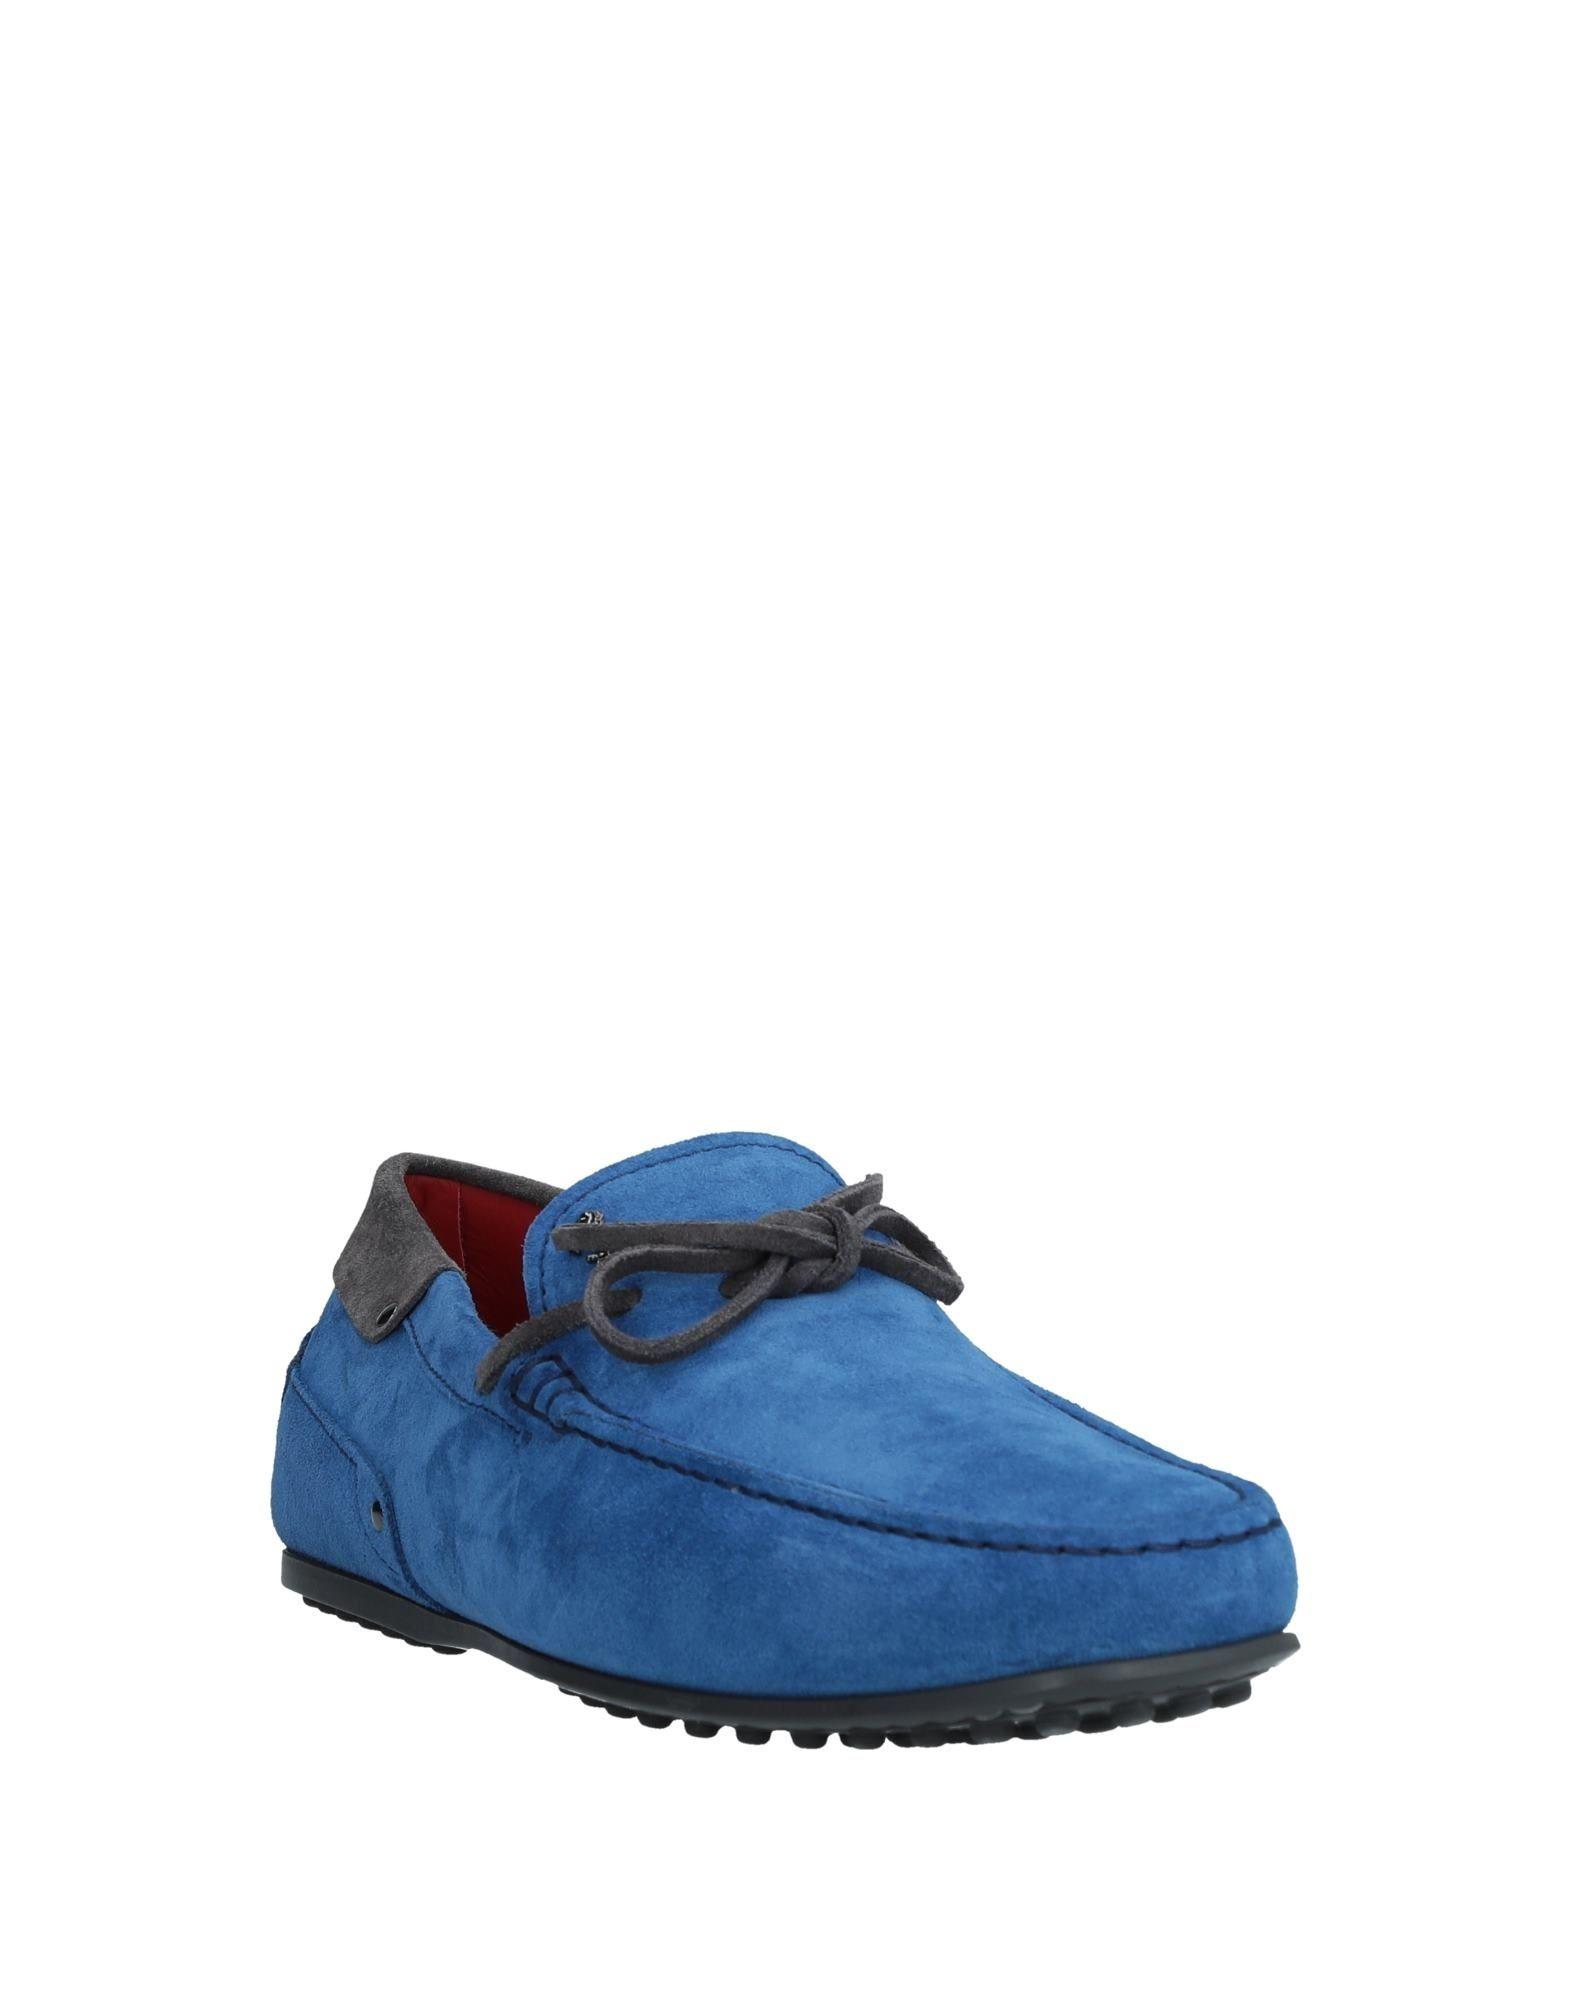 Tod's Mokassins Herren  11541660MW Gute Qualität beliebte Schuhe